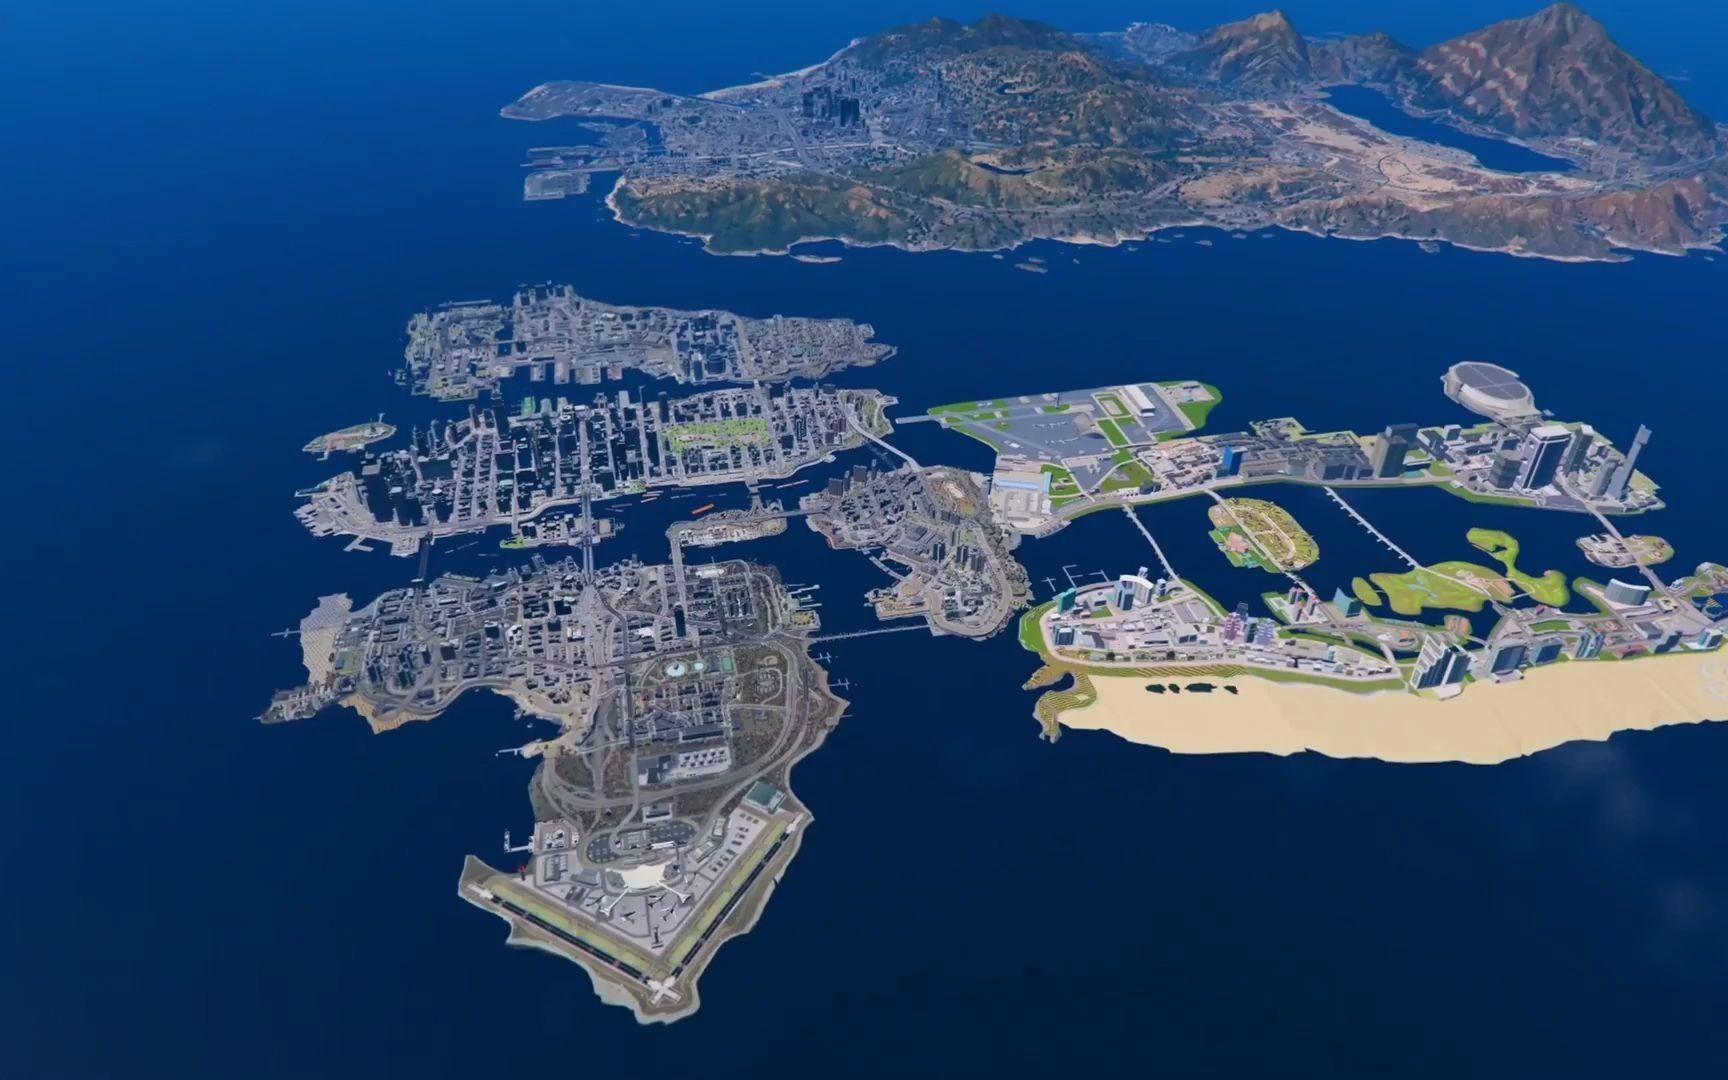 《GTA5》地图超大的扩展版(包括:罪恶都市,GTA4,圣安地列斯等)